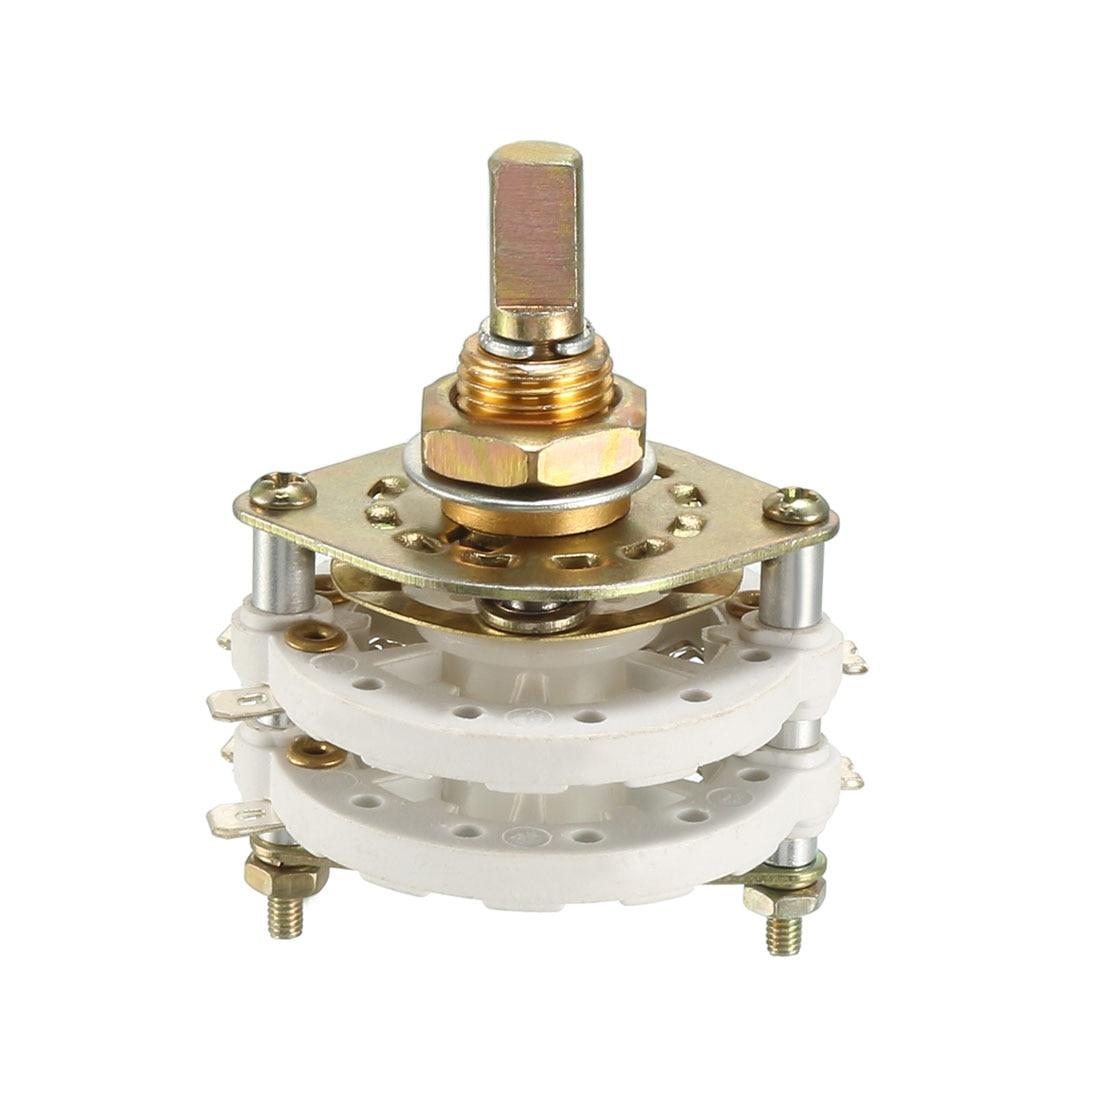 Uxcell 2P6T 2 Pole 6, interruptor rotativo de 2 pisos de lanzamiento, Selector de banda de canal de banda